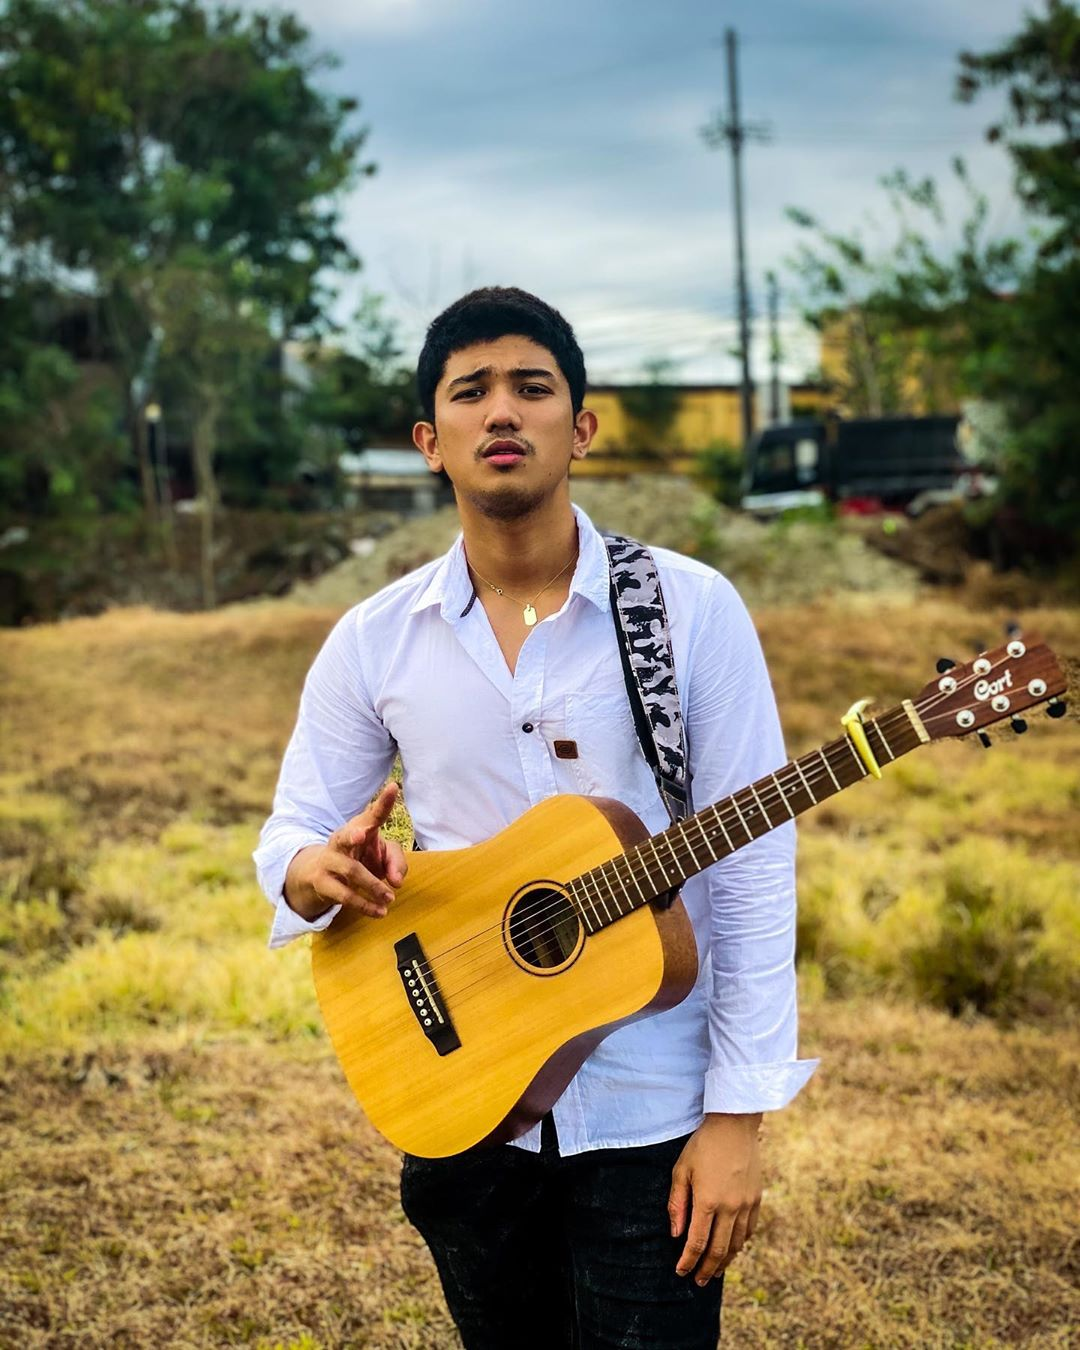 Jeremiah Tiangco Saludo